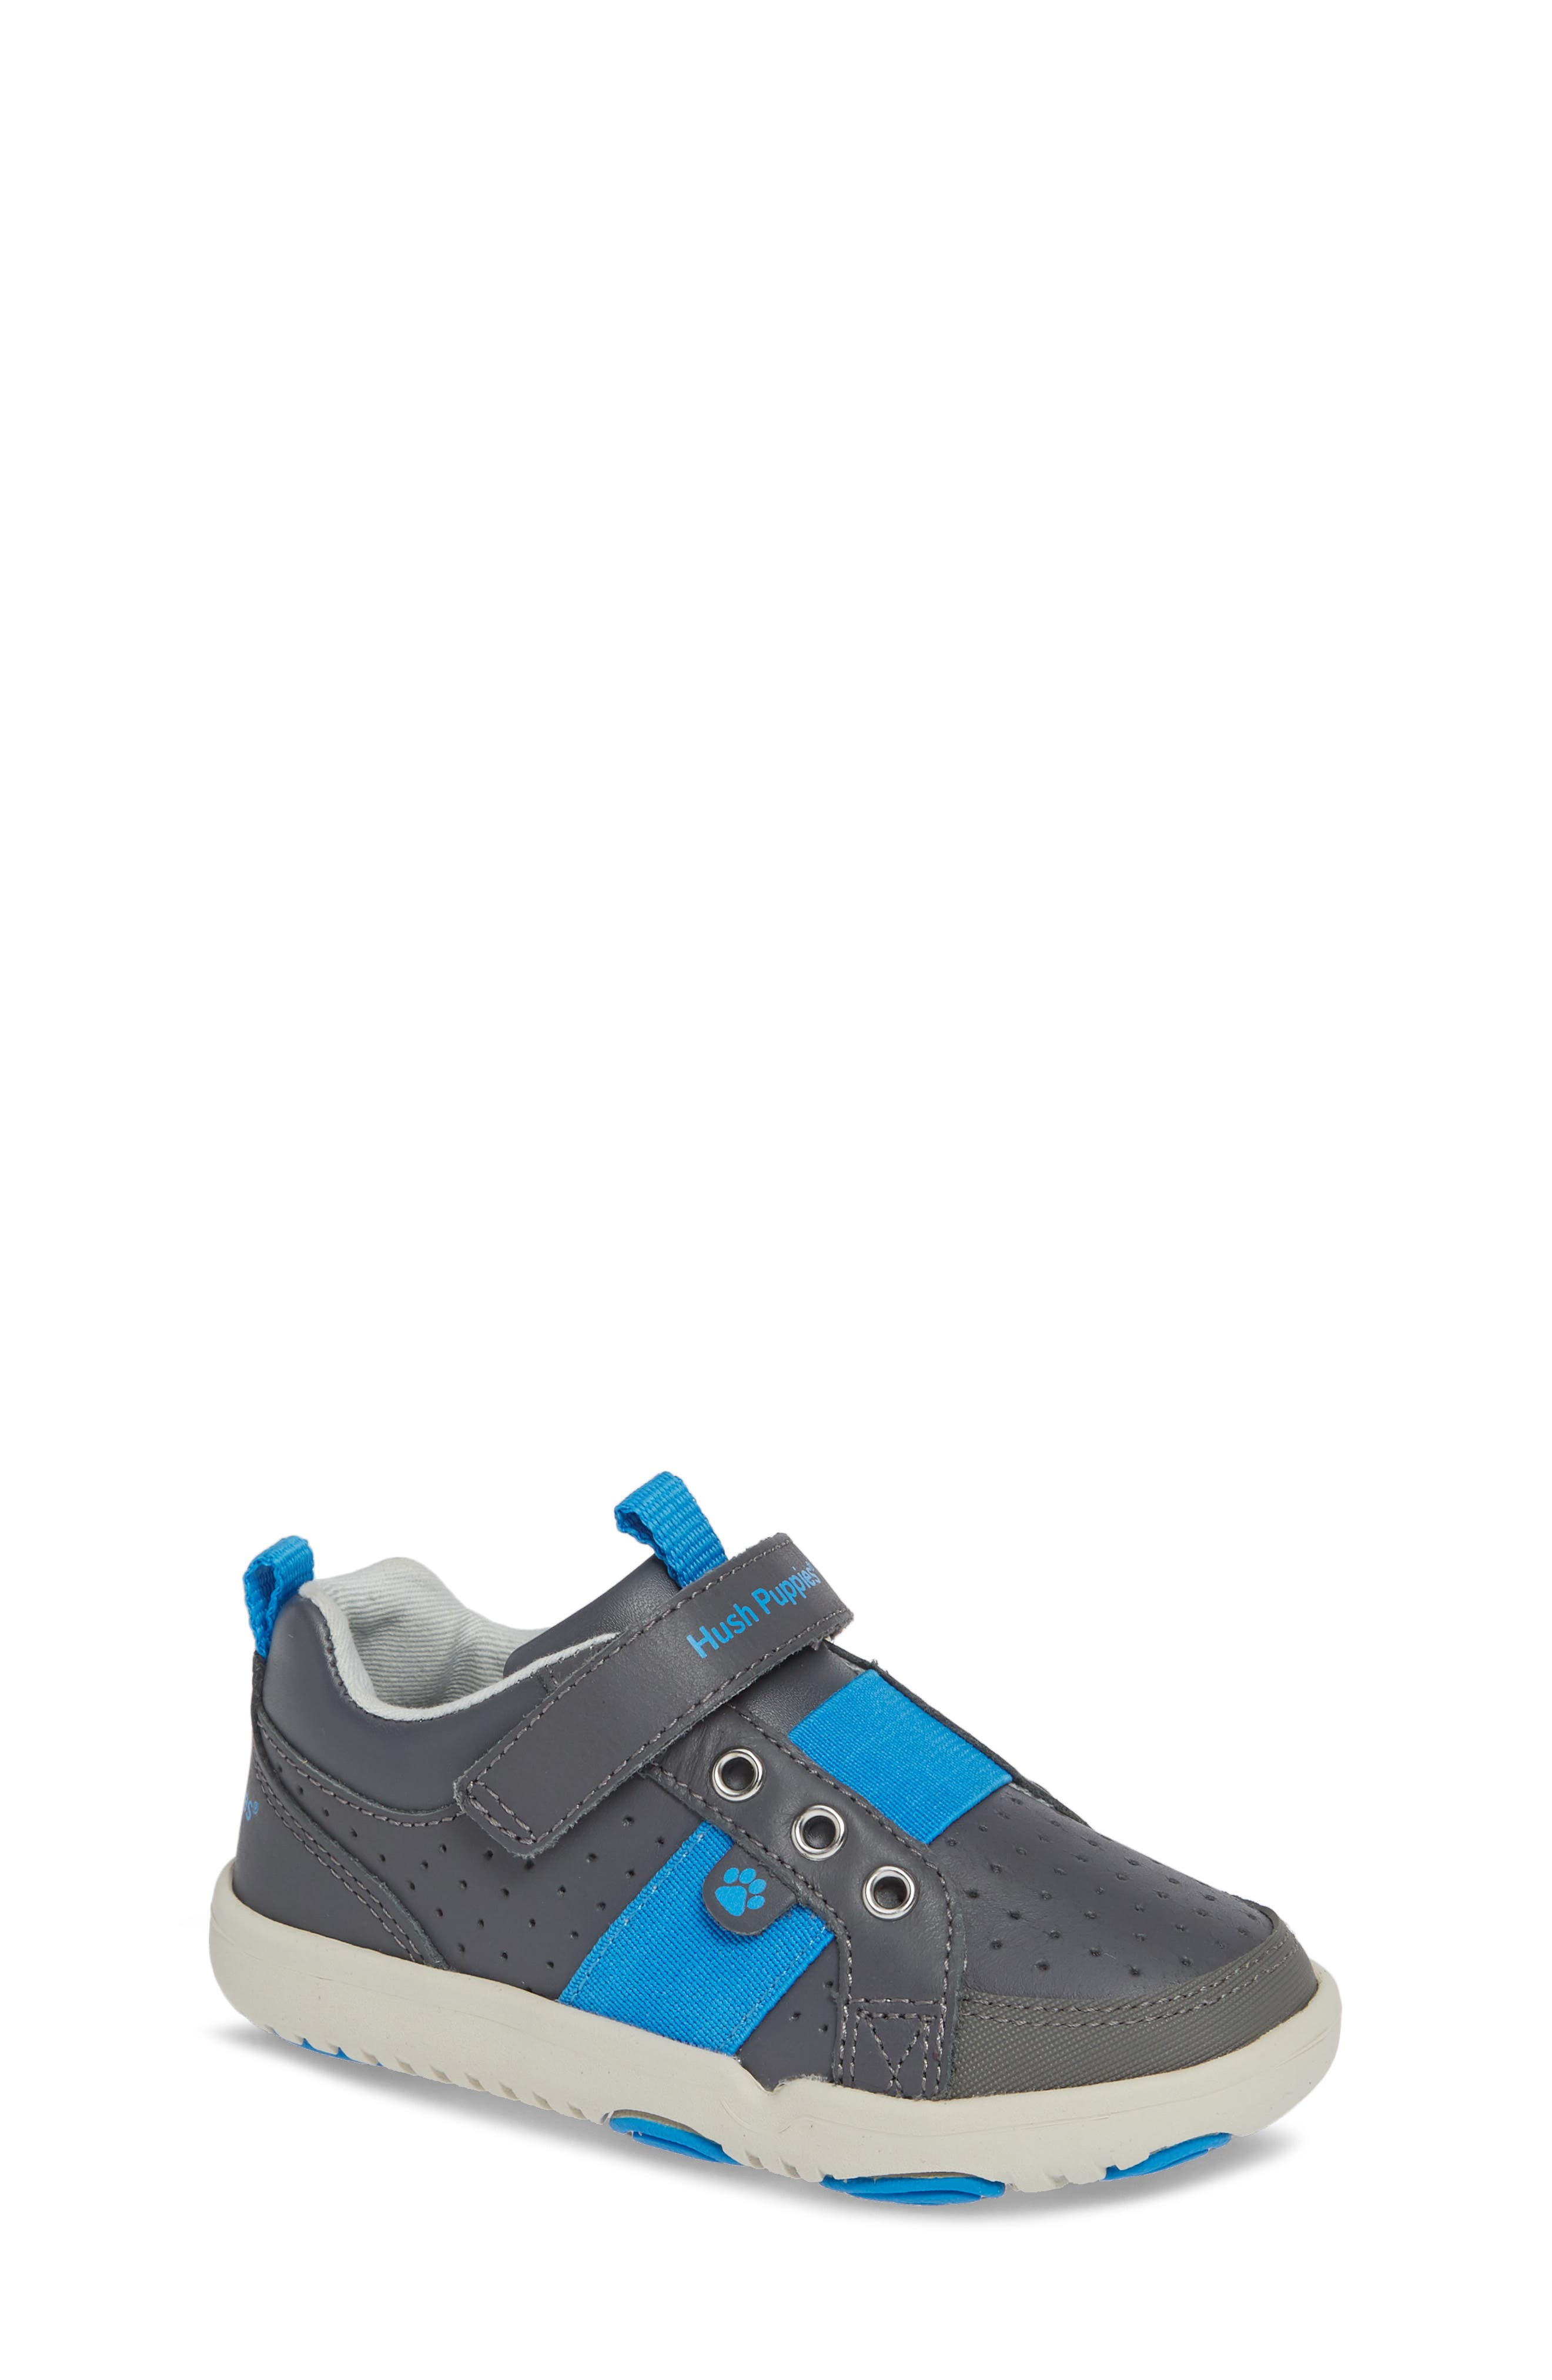 Jesse Sneaker,                         Main,                         color, GREY